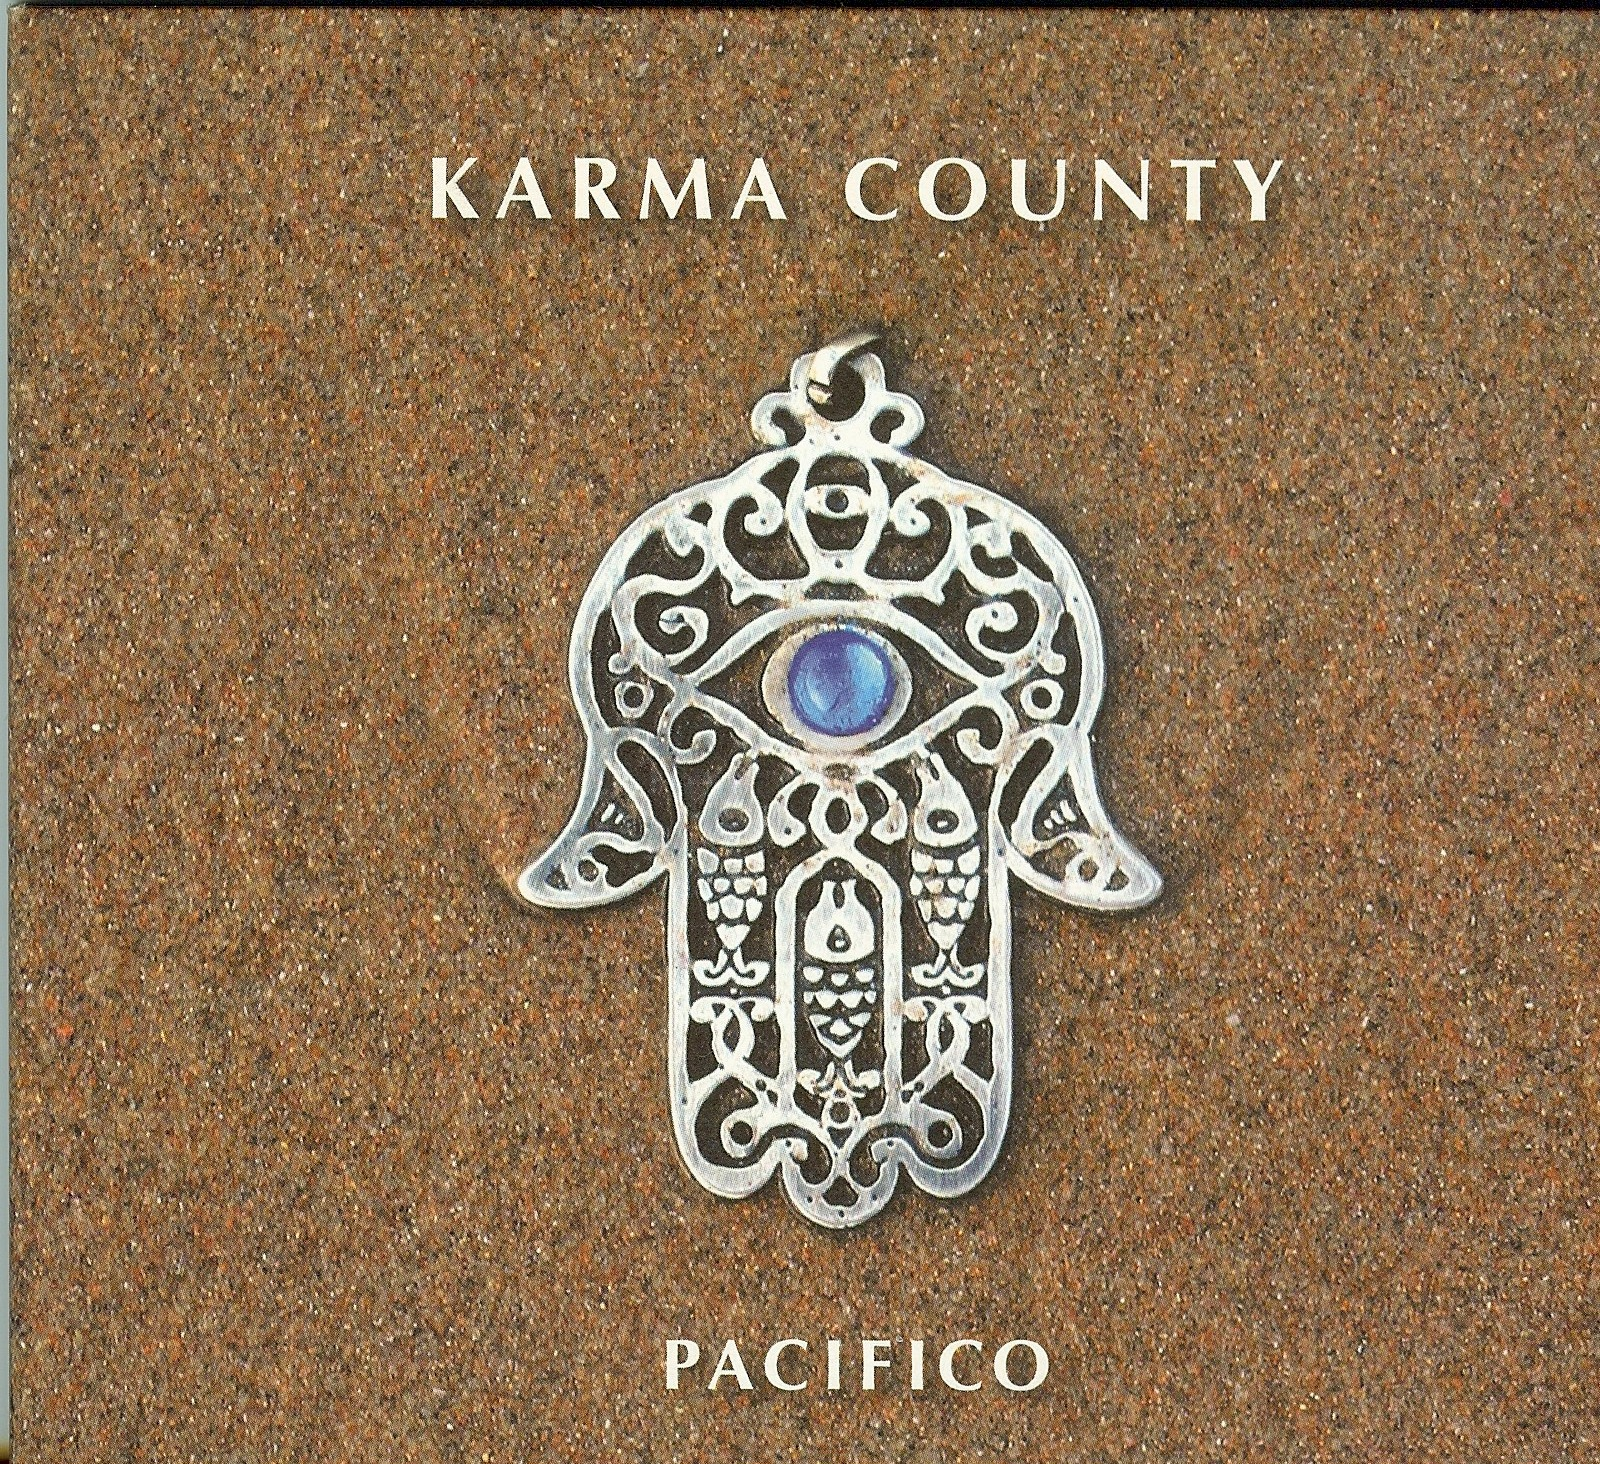 KarmaCounty_Pacifico.jpeg